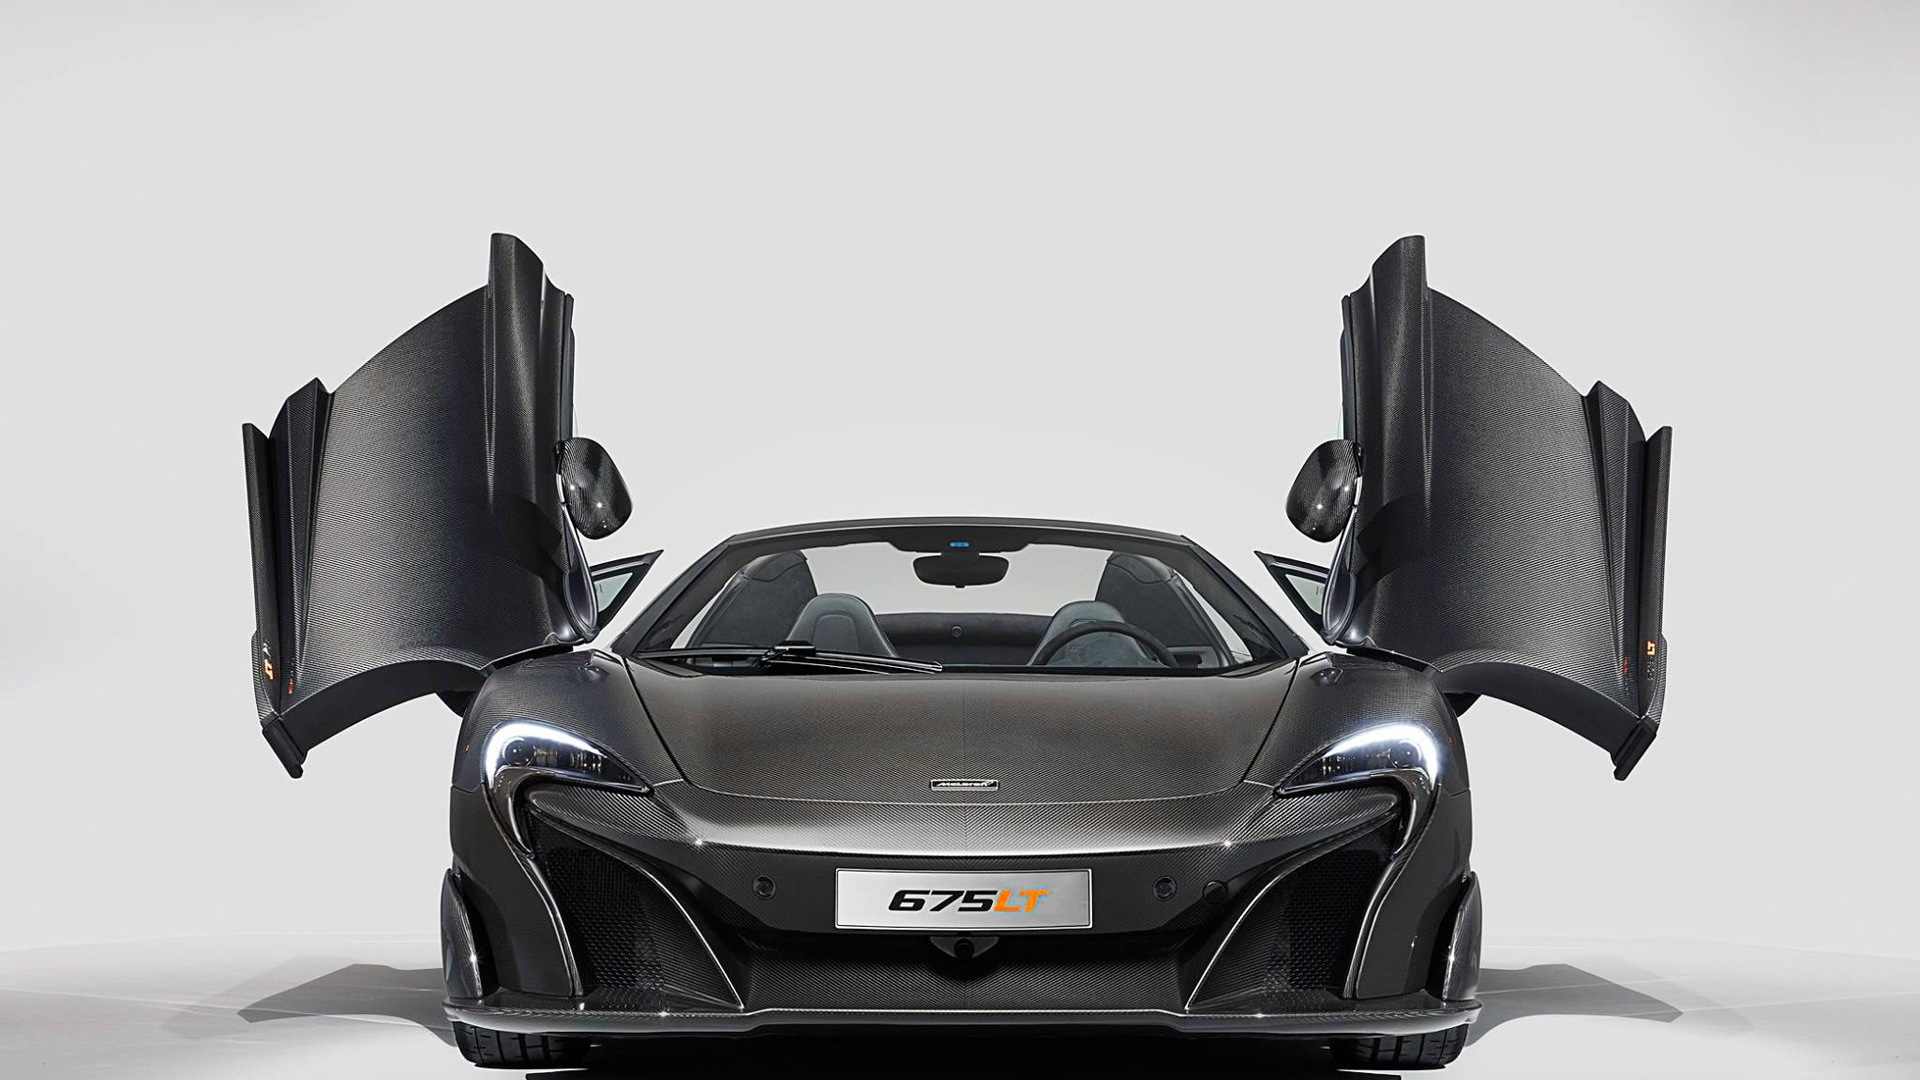 2017 McLaren MSO Carbon Series LT